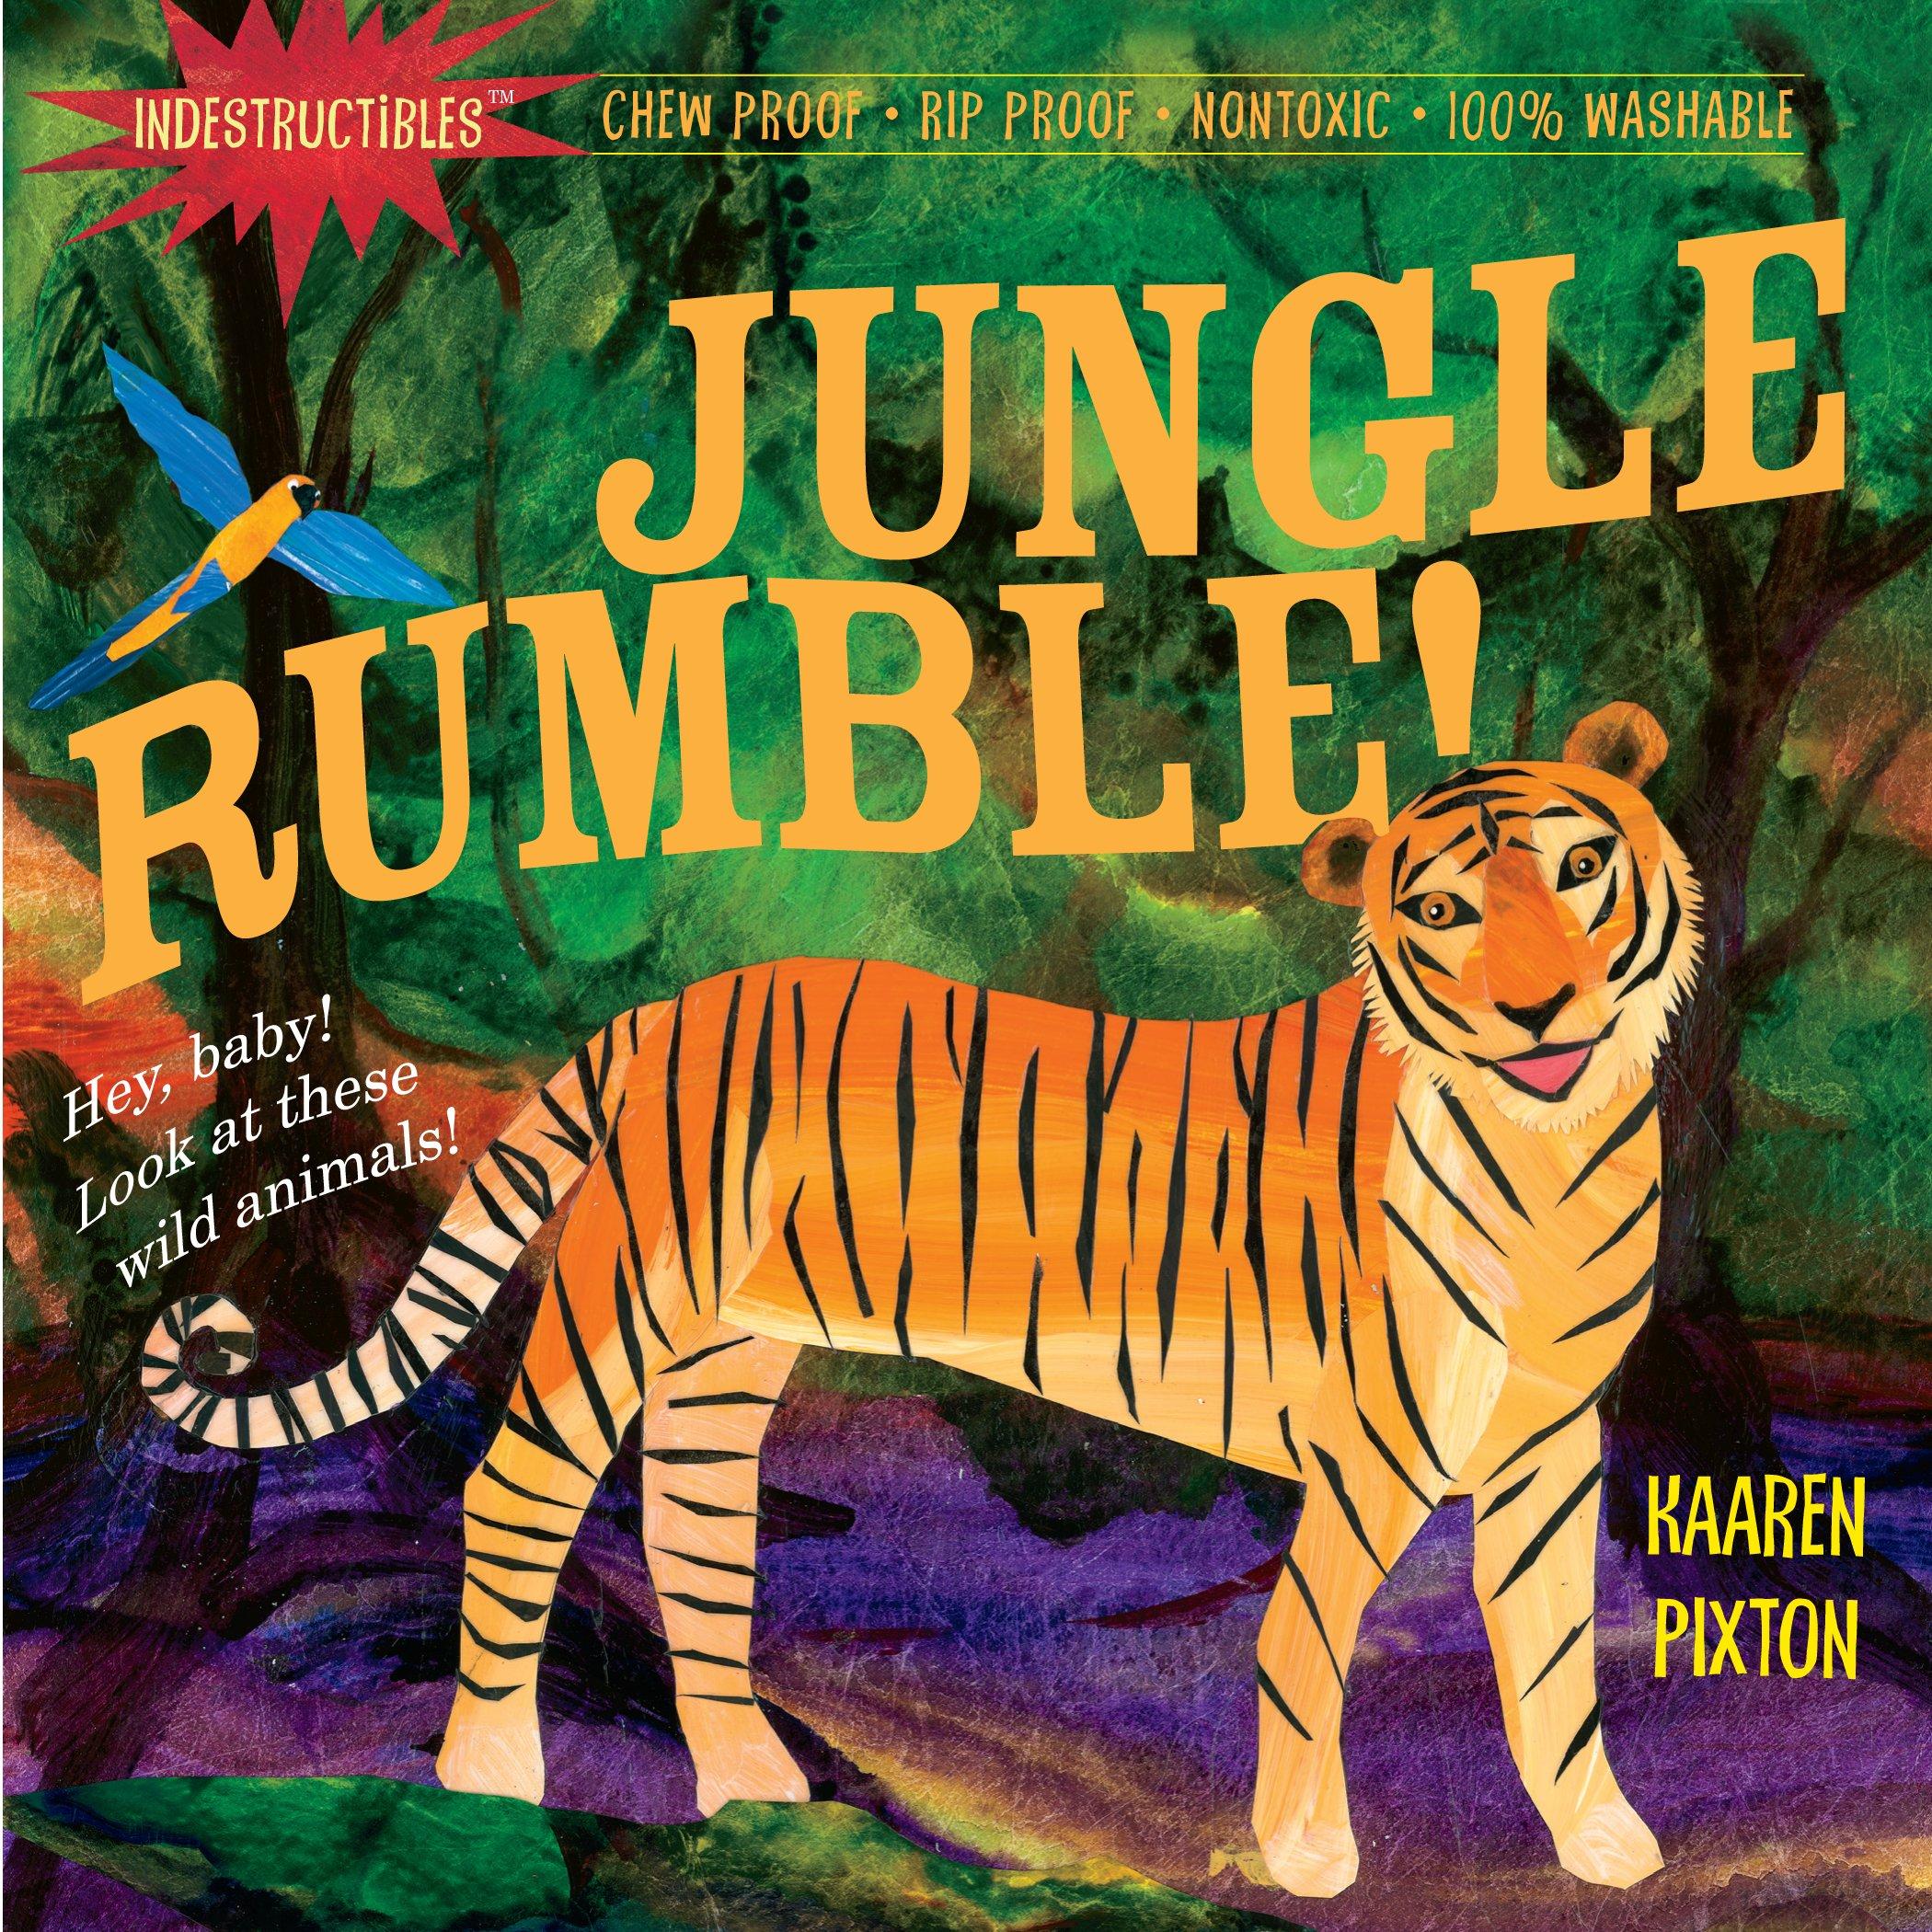 Indestructibles Jungle Rumble Kaaren Pixton product image